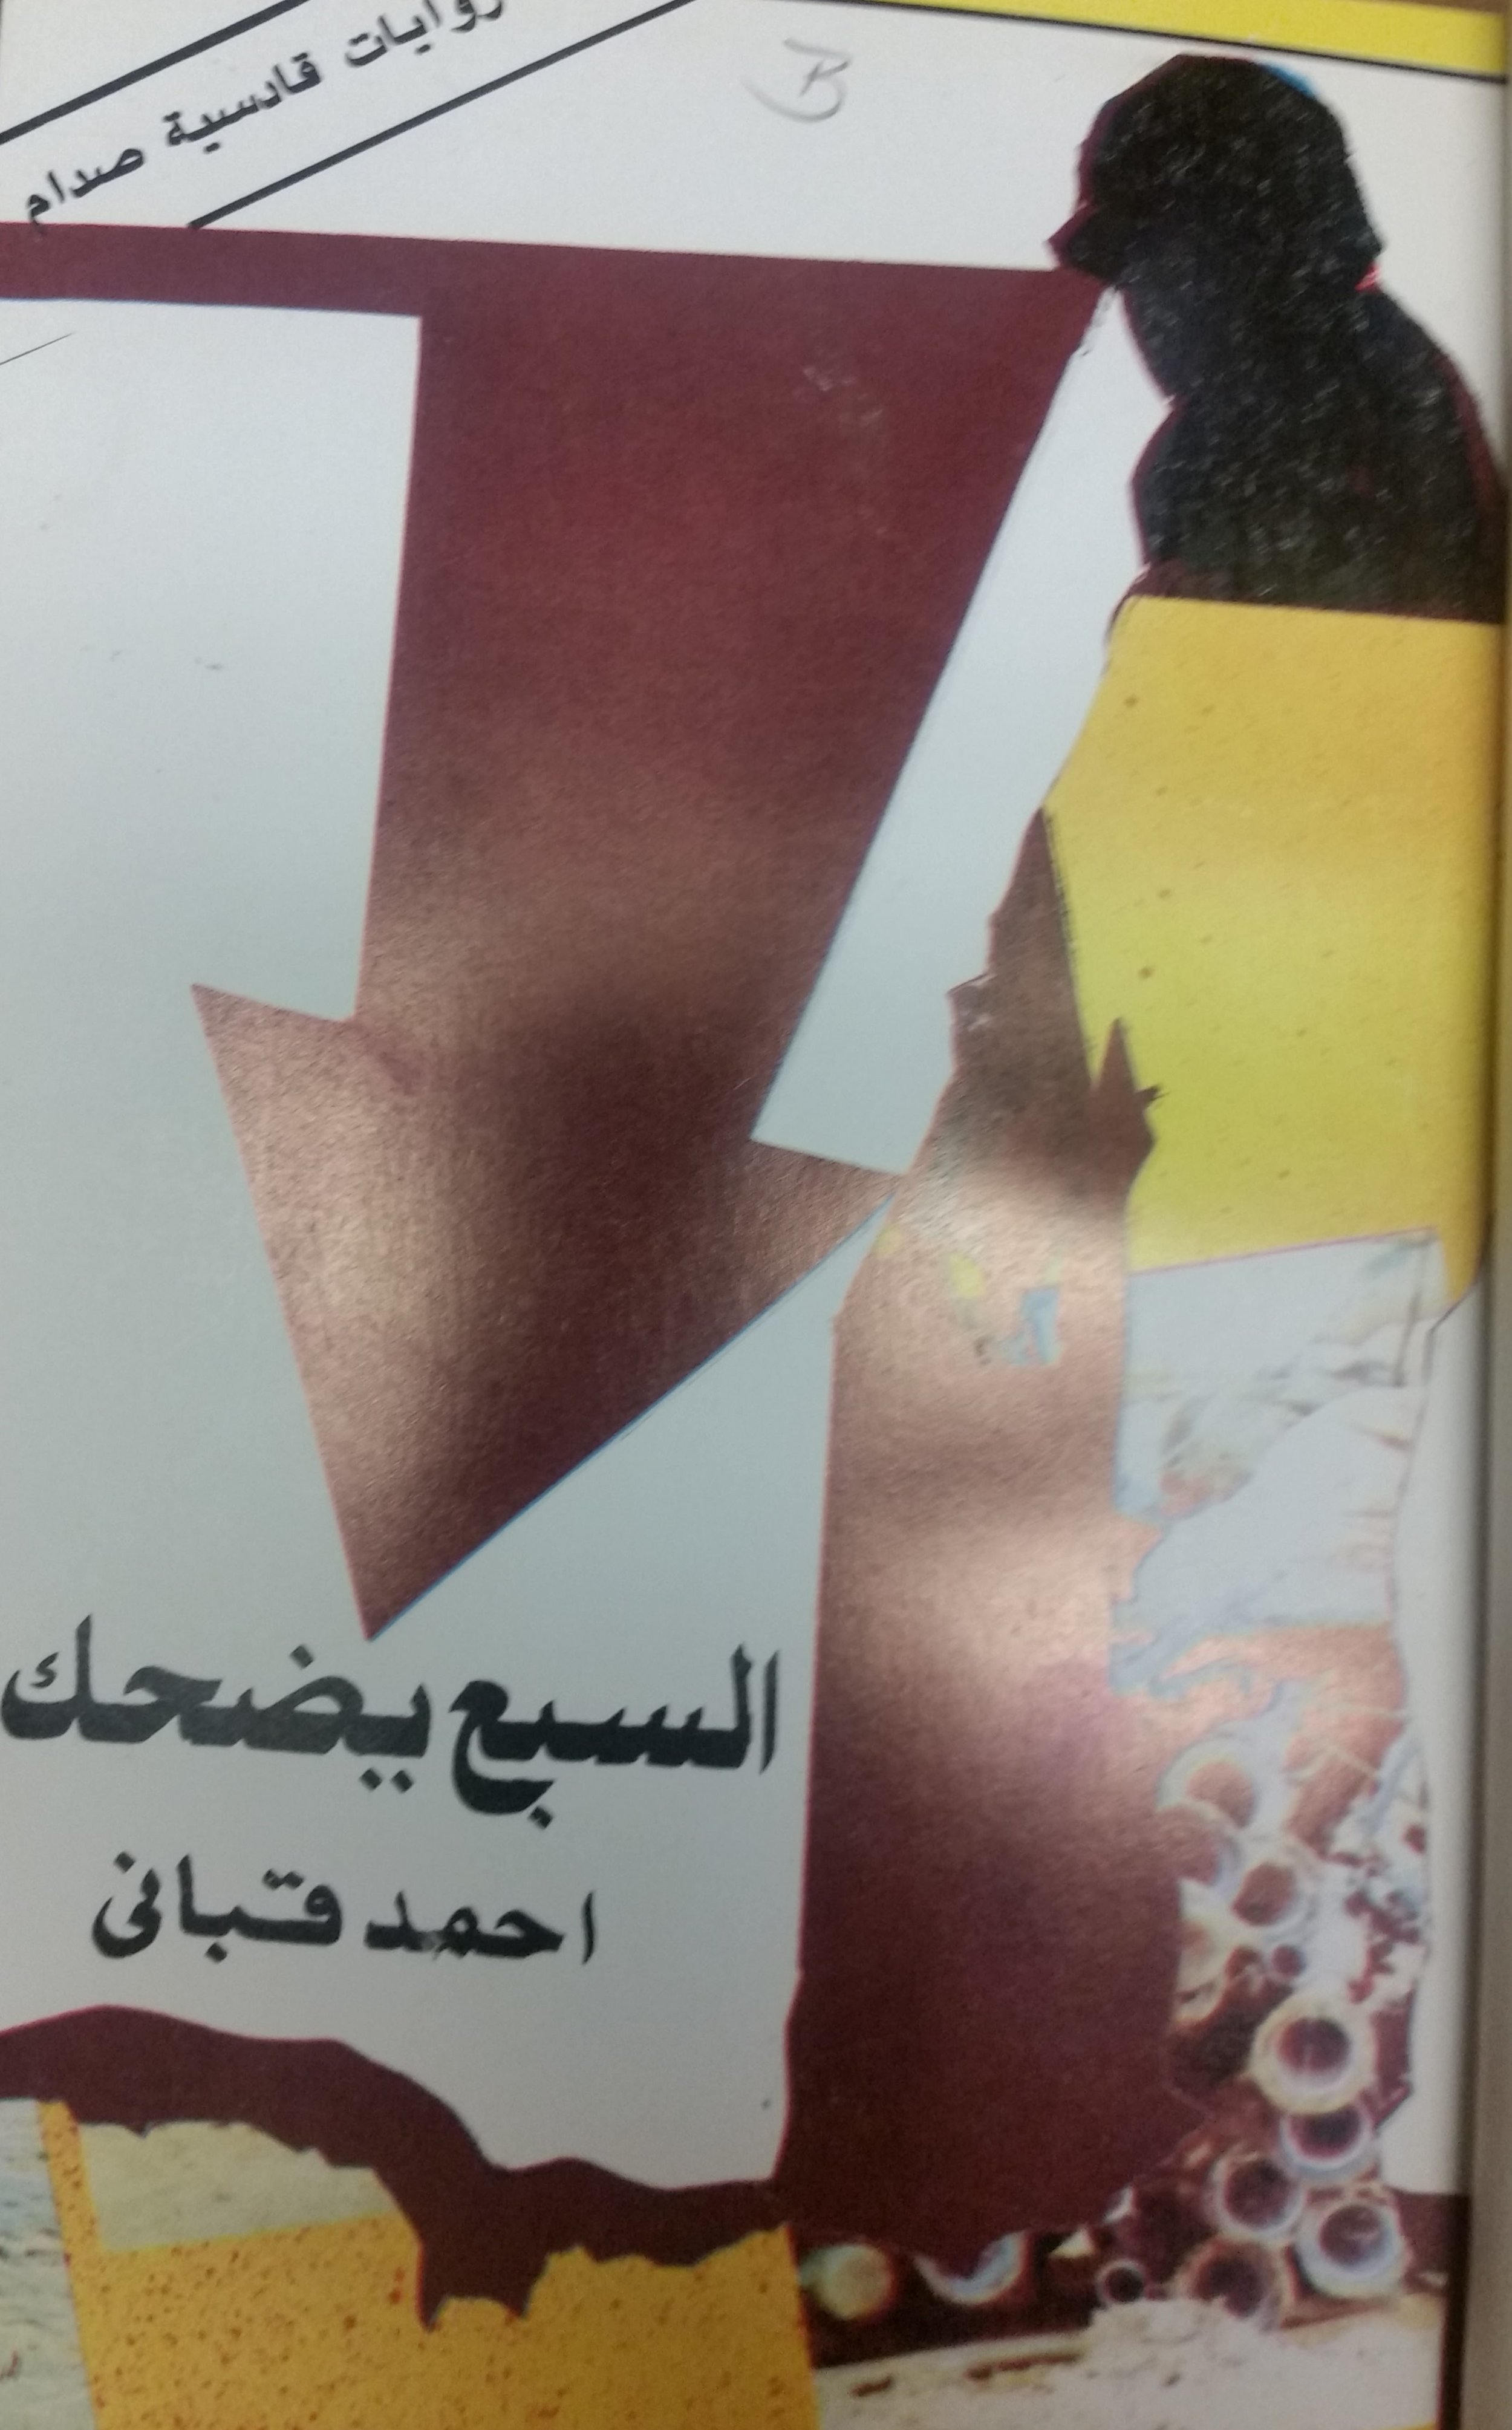 1985 novel from the series  Riwāyāt Qādisiyyat Ṣaddām.